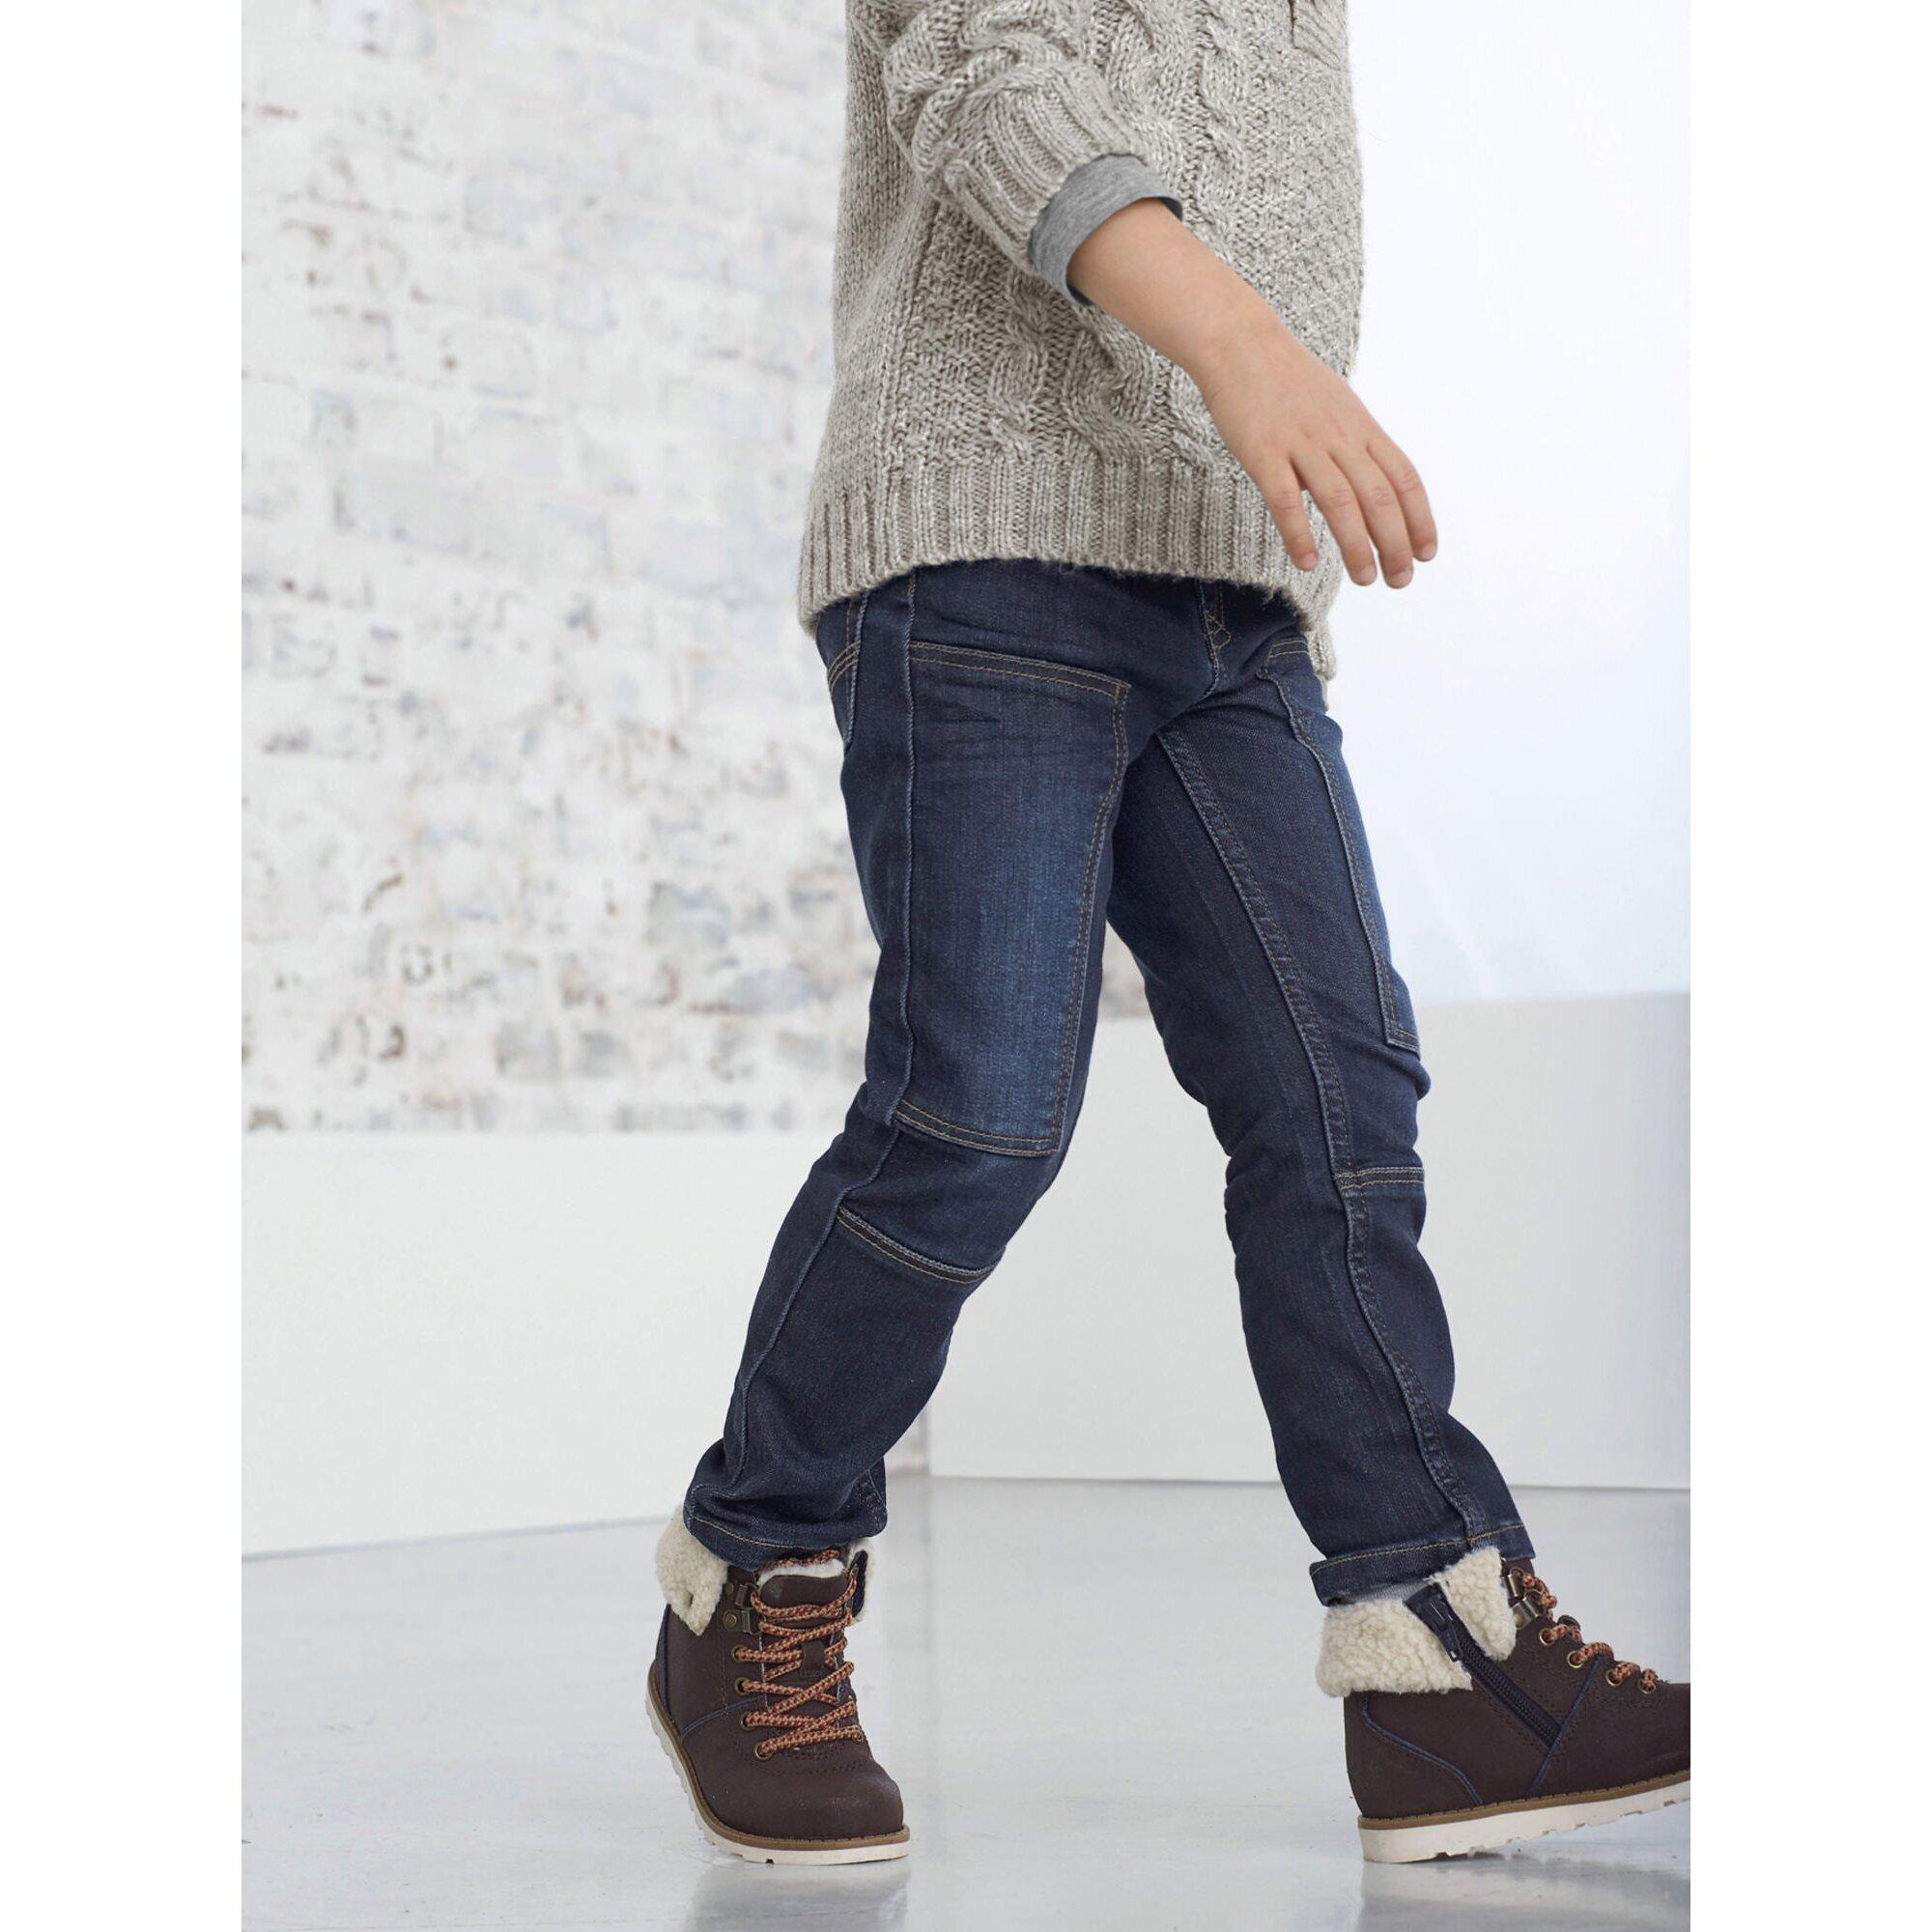 vertbaudet-jungen-slim-fit-jeans-atmungsaktiv, 25.99 EUR @ babywalz-de